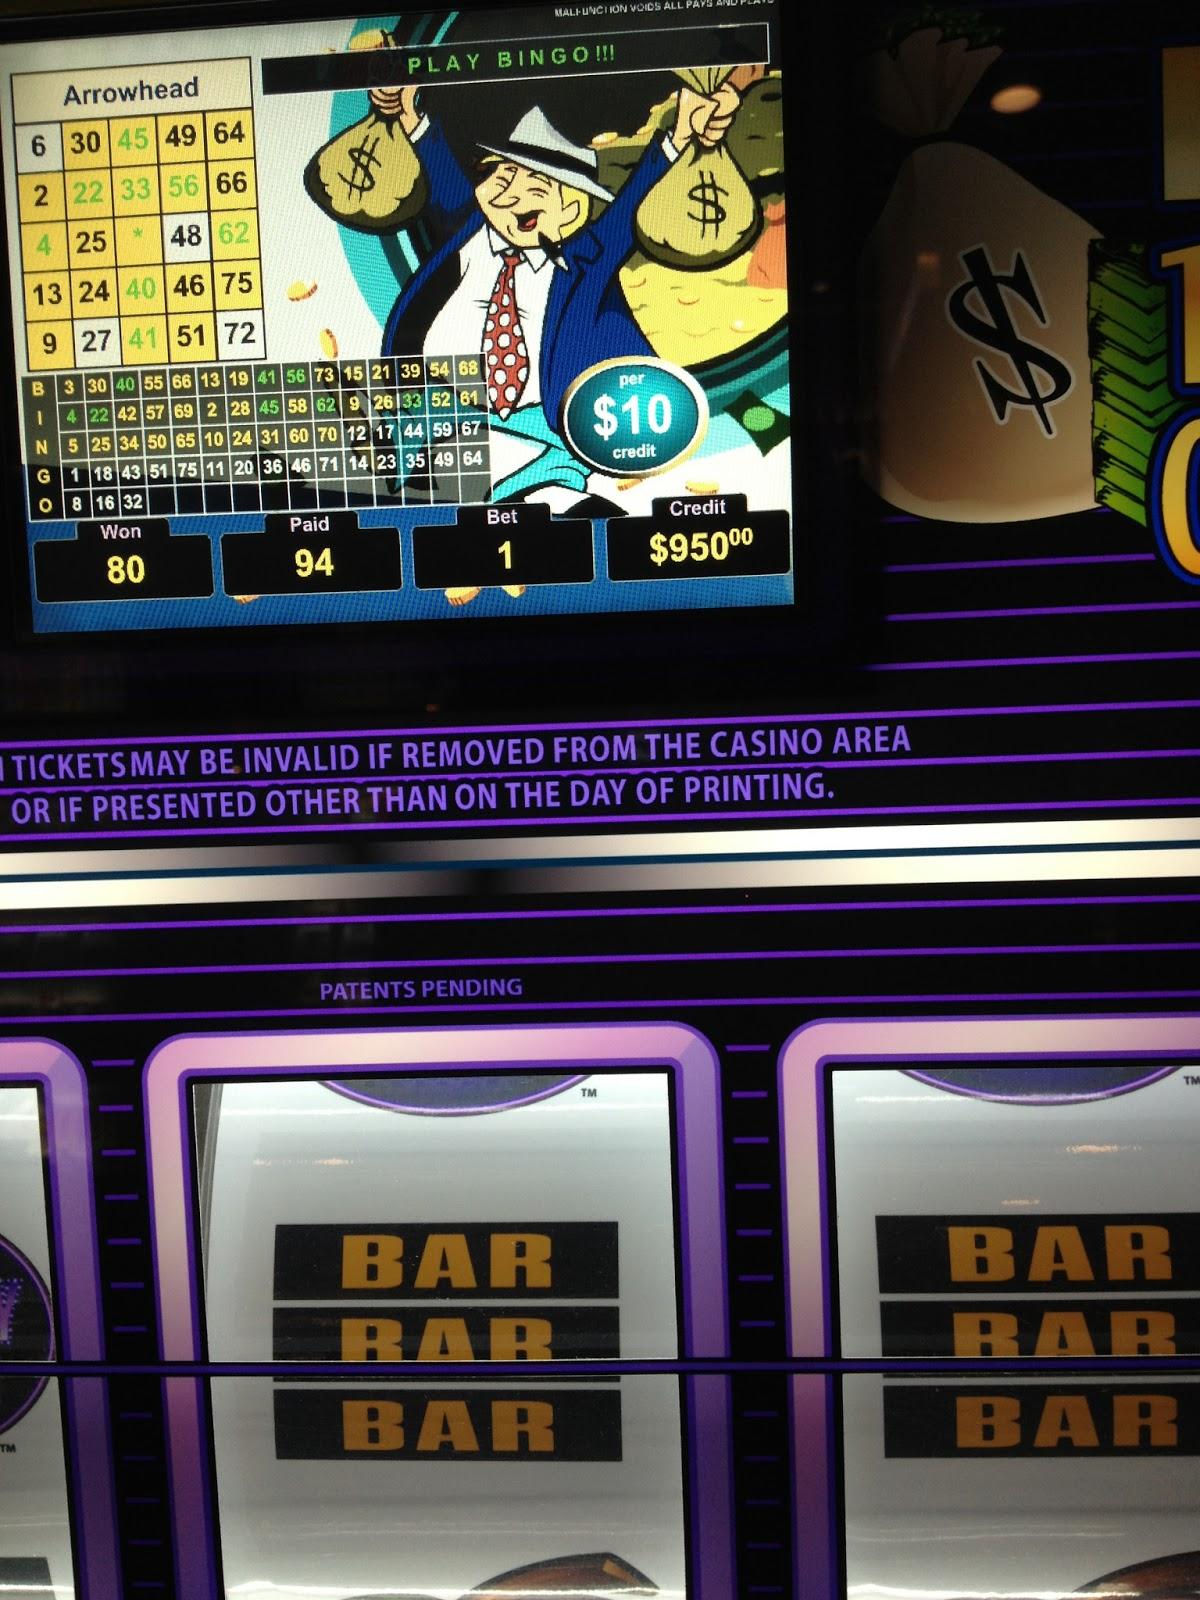 Vgt Slot Machine Jackpots My Jackpots So Far This Year